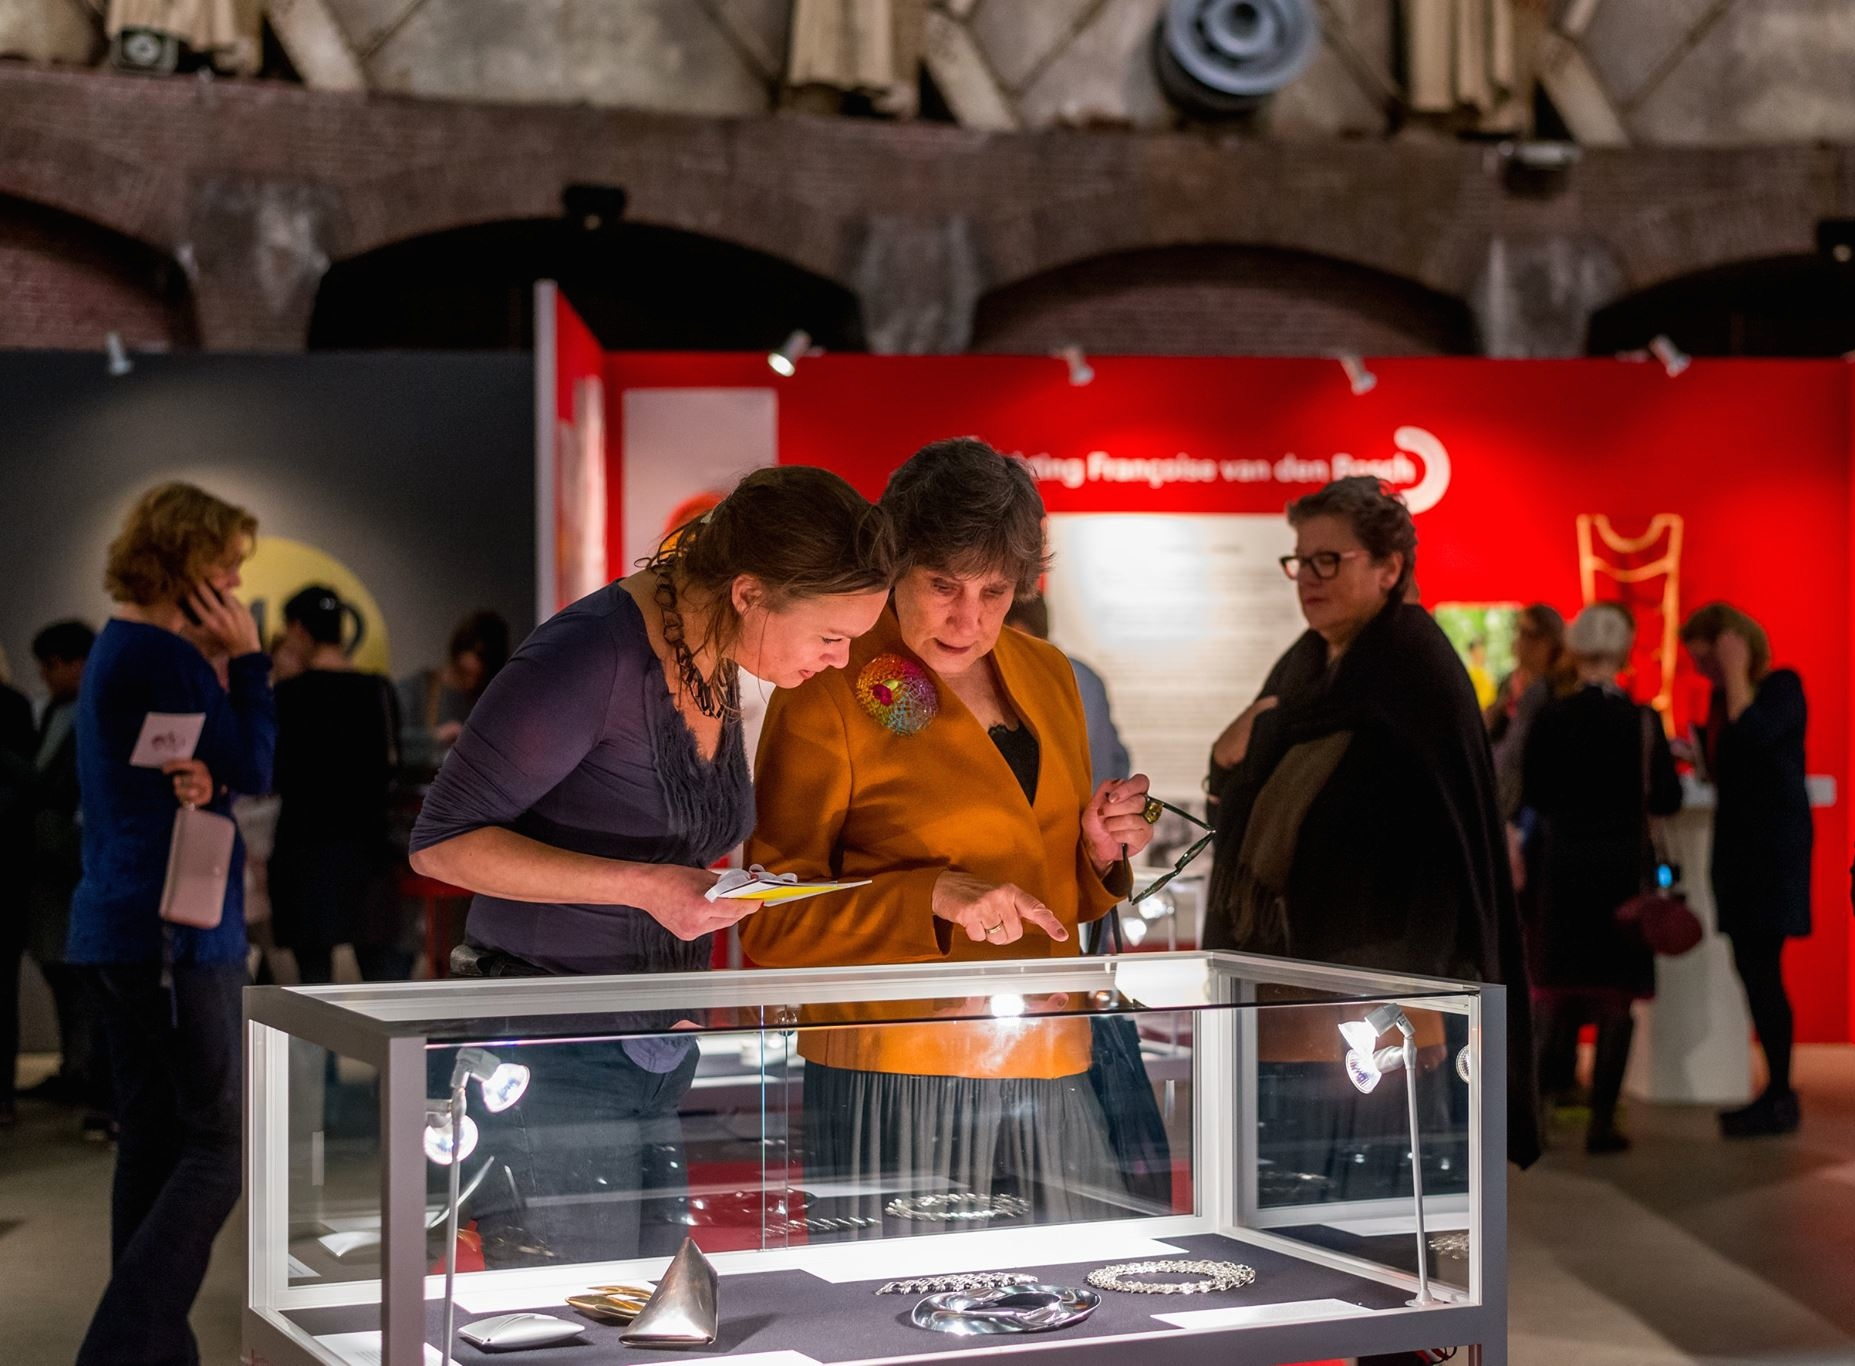 Sieraad Art Fair 2015, Esther Doornbusch en Miecke Oosterman, beurs, portret, Gashouder, Westergasfabriek, Amsterdam, foto Arjen Veldt, vitrine, Françoise van den Bosch